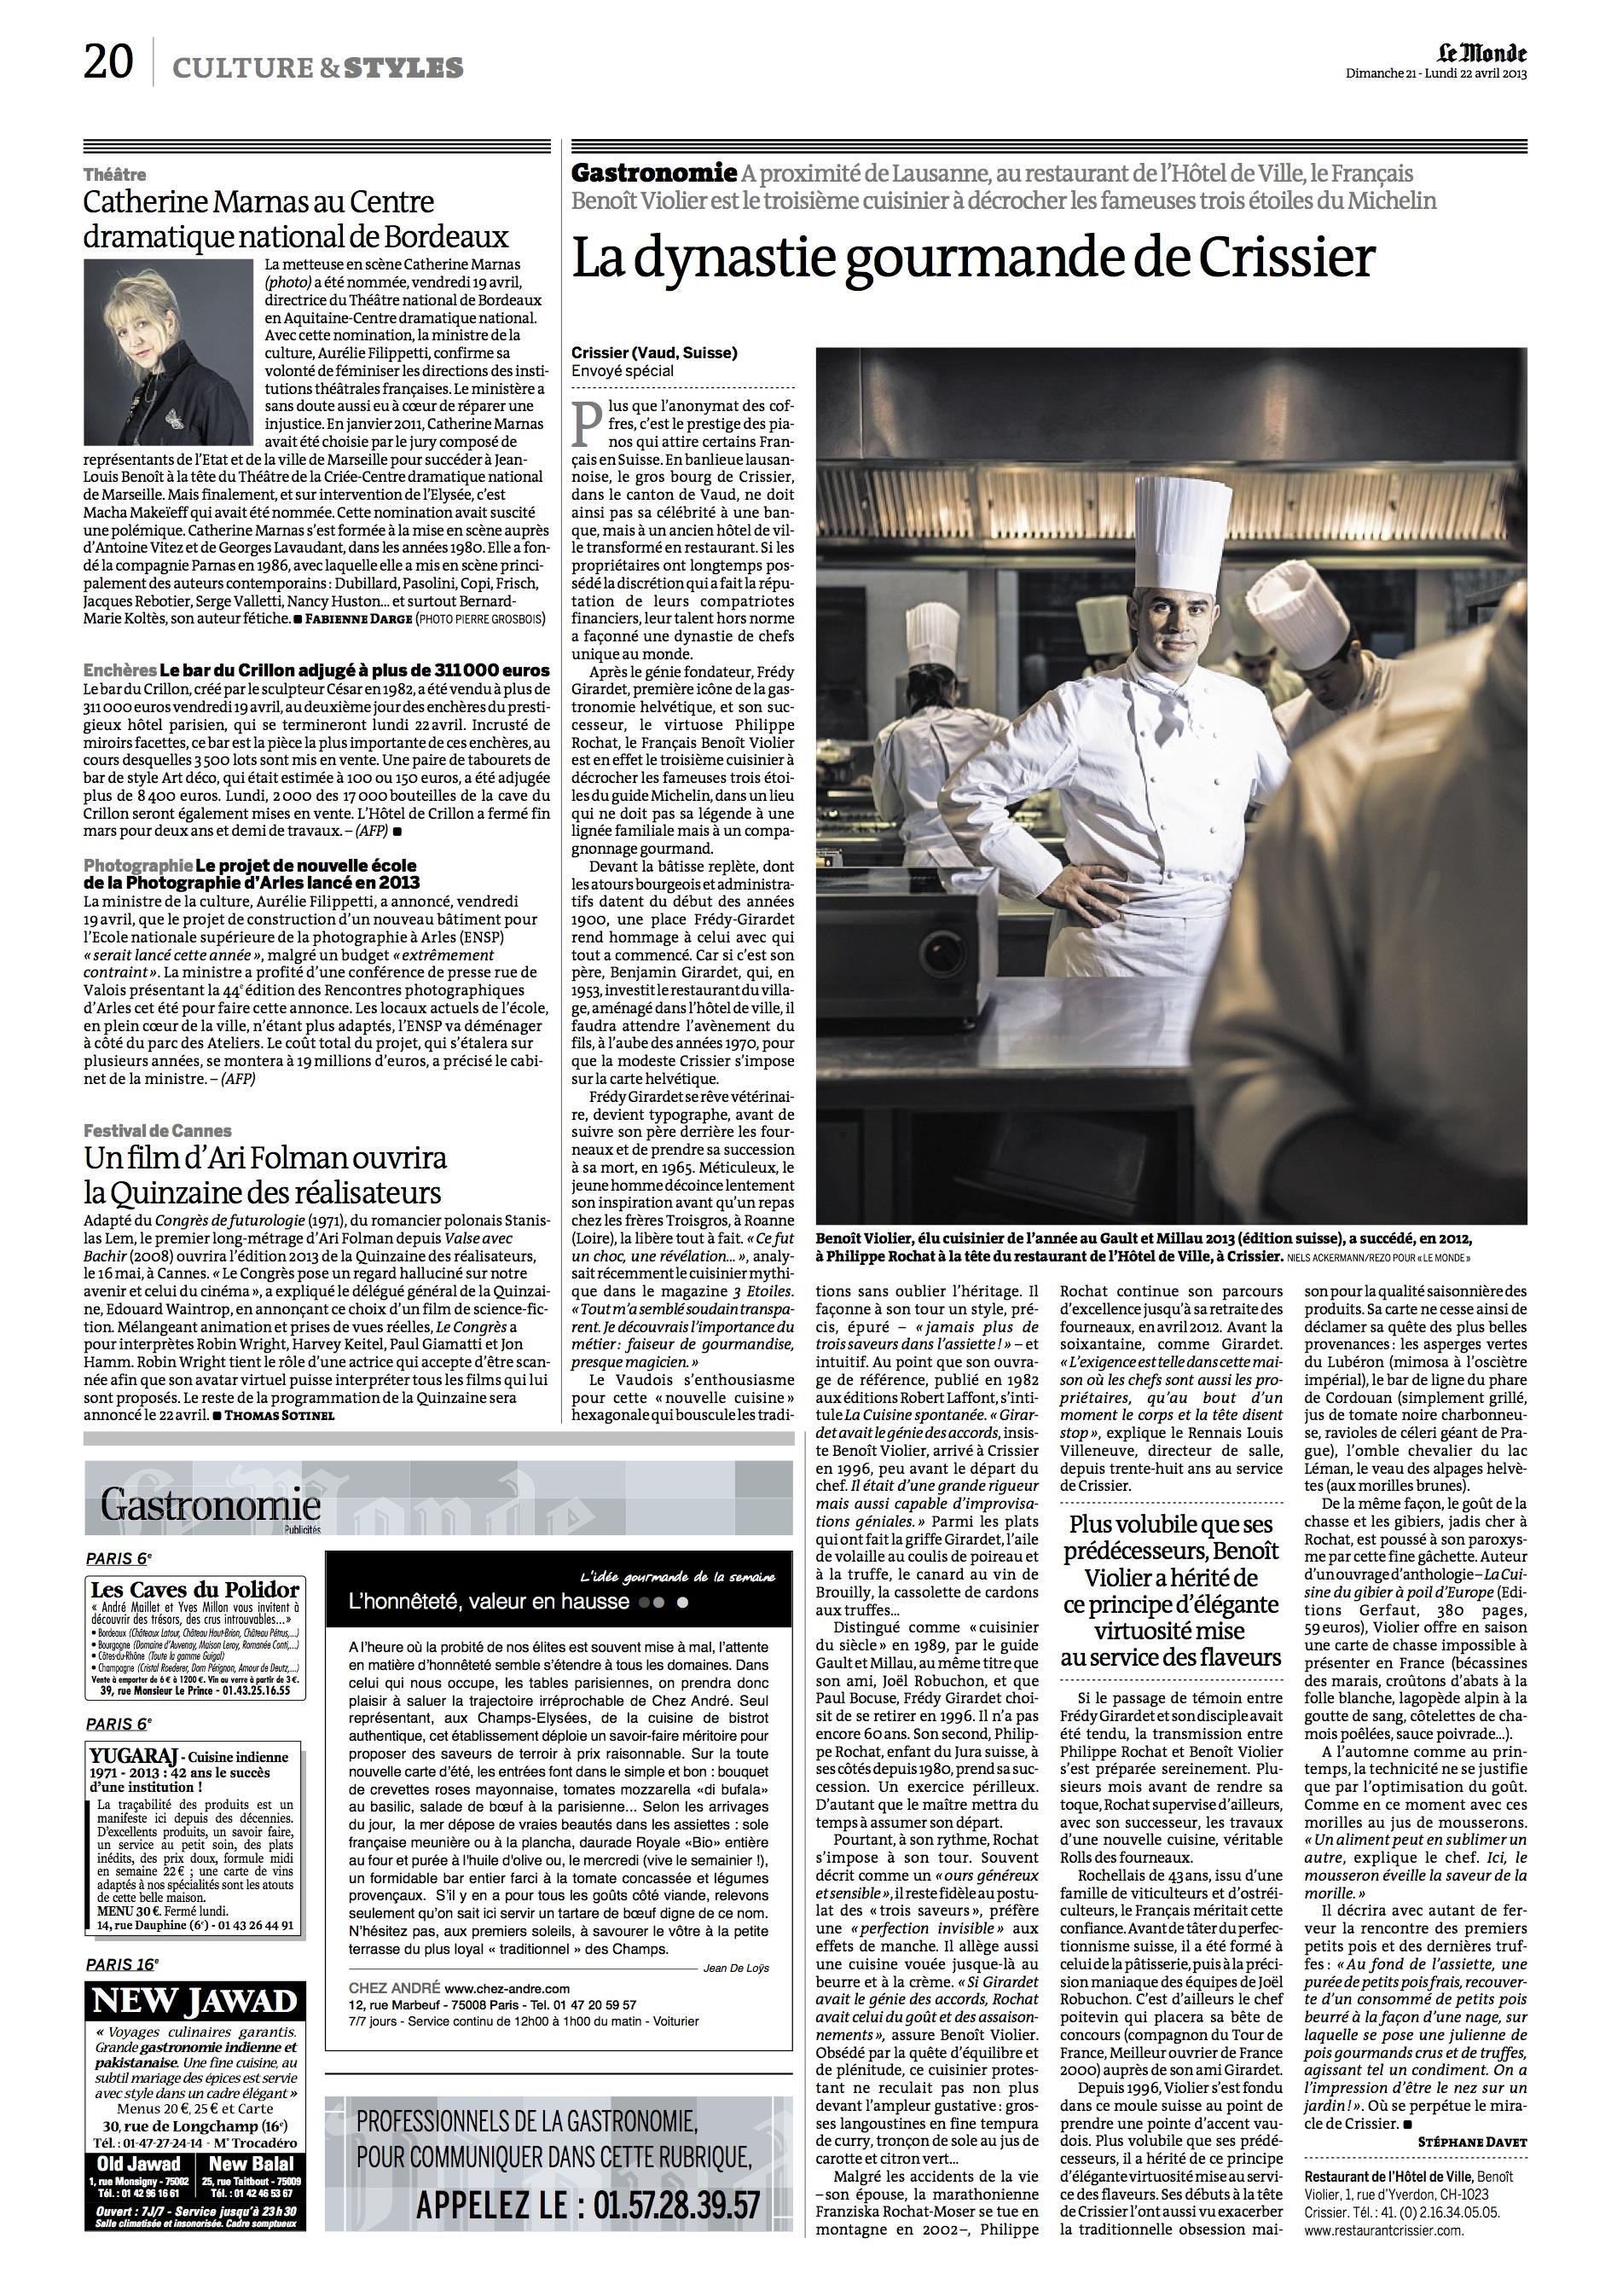 Le Monde 13-04-21.jpg